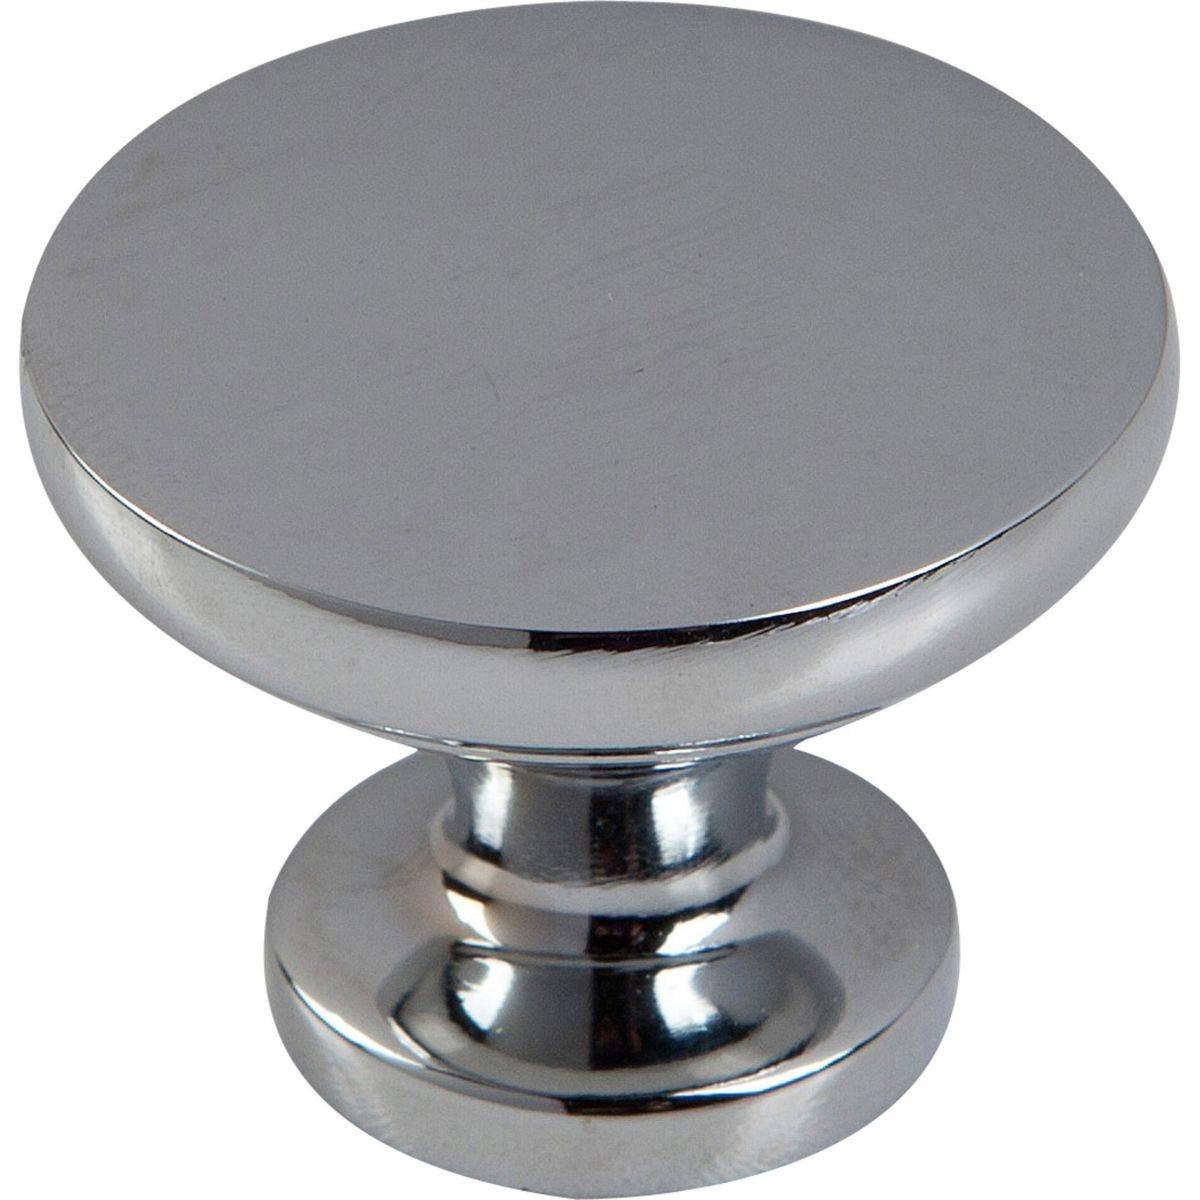 Select Hardware 30mm Diameter Polished Chrome Knob (6 Pack)